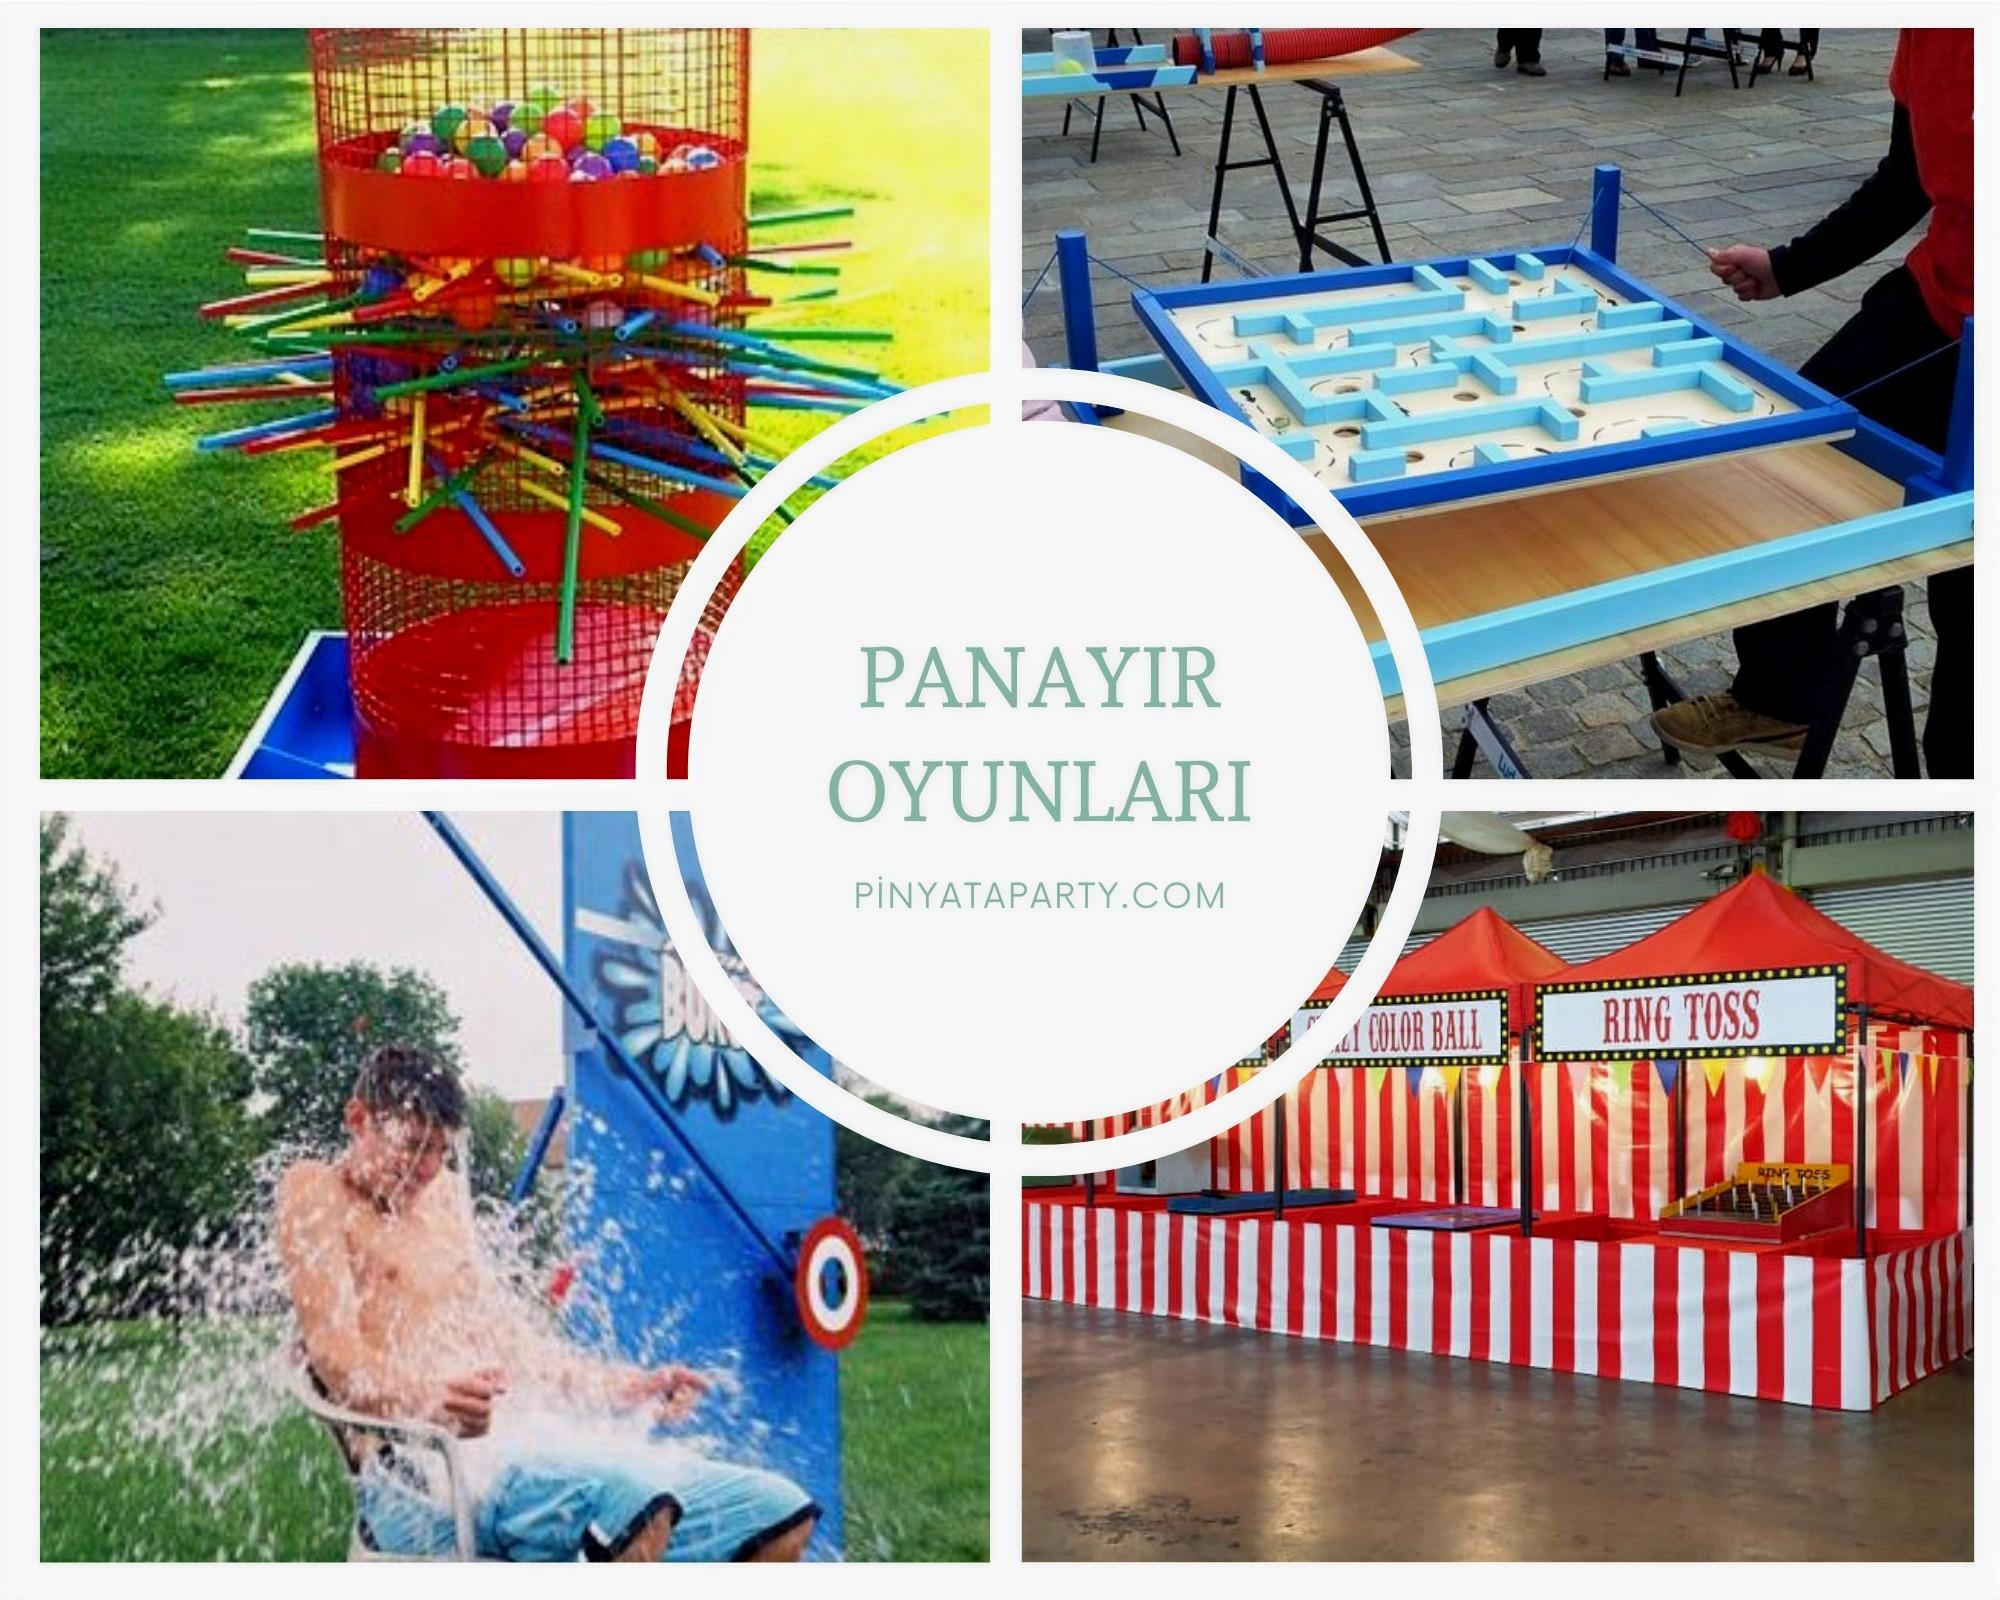 Piknik-Panayir-Oyunlari_edited